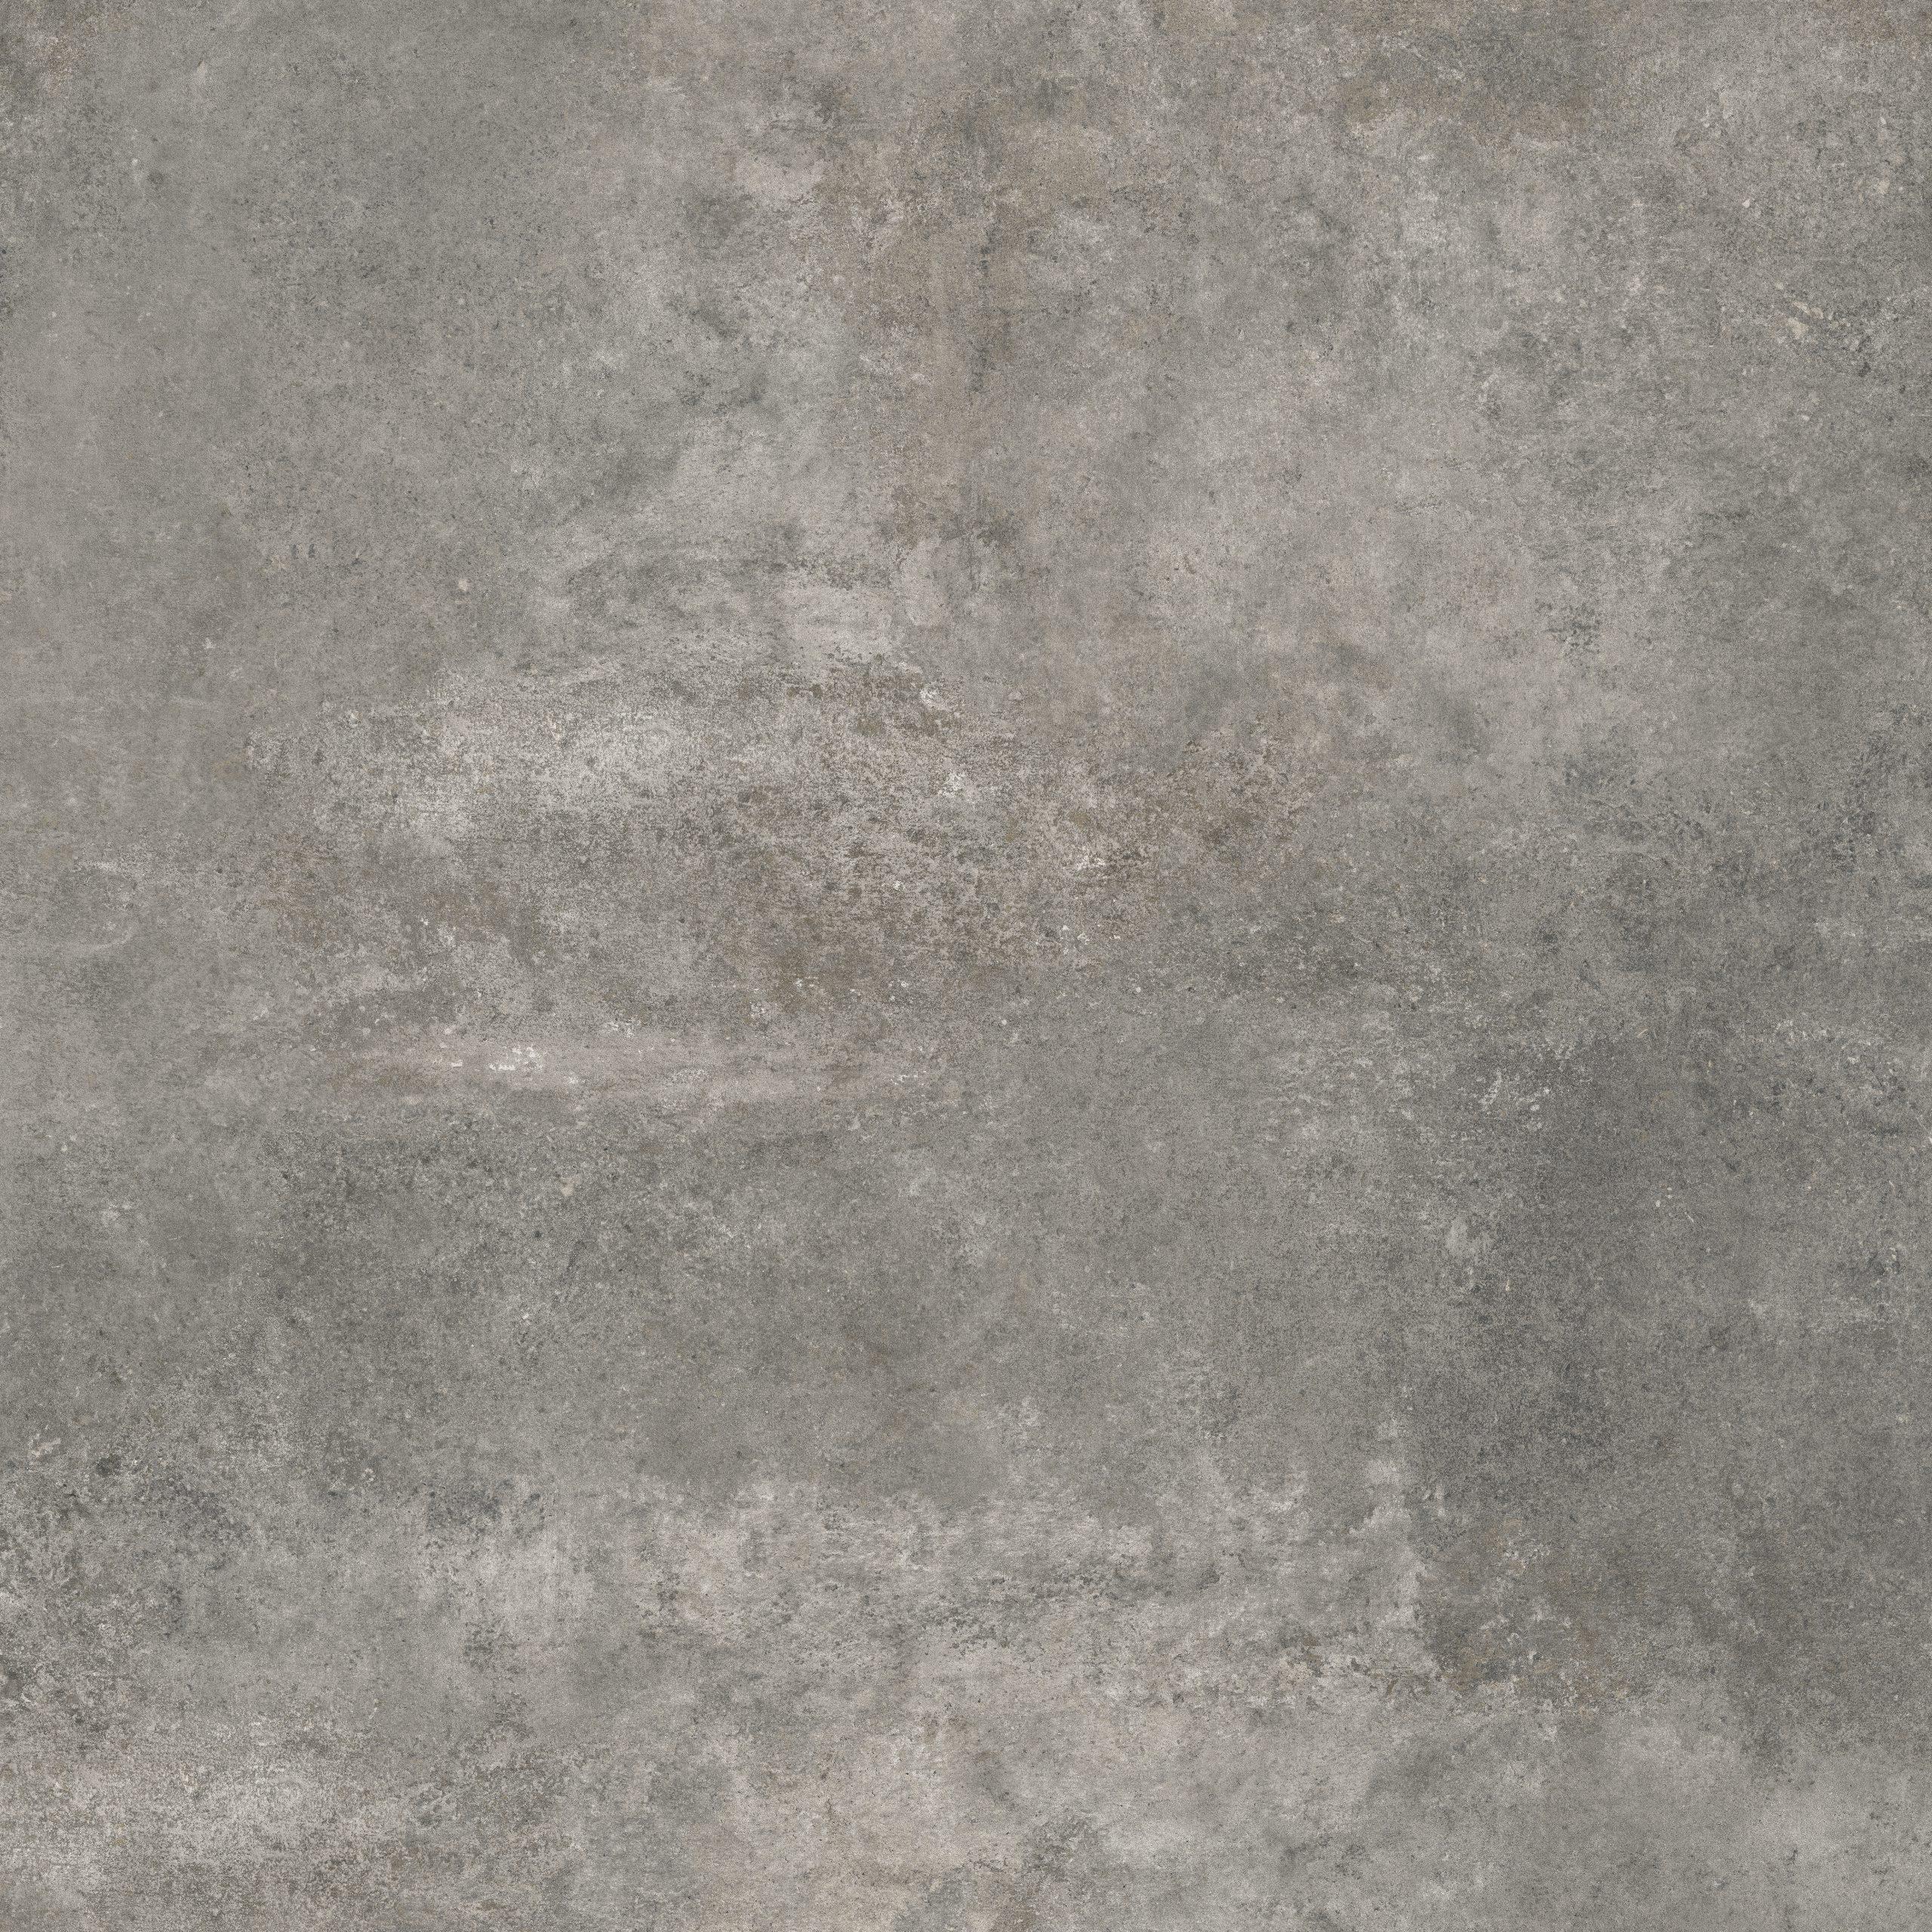 Lifestone Taupe 90x90